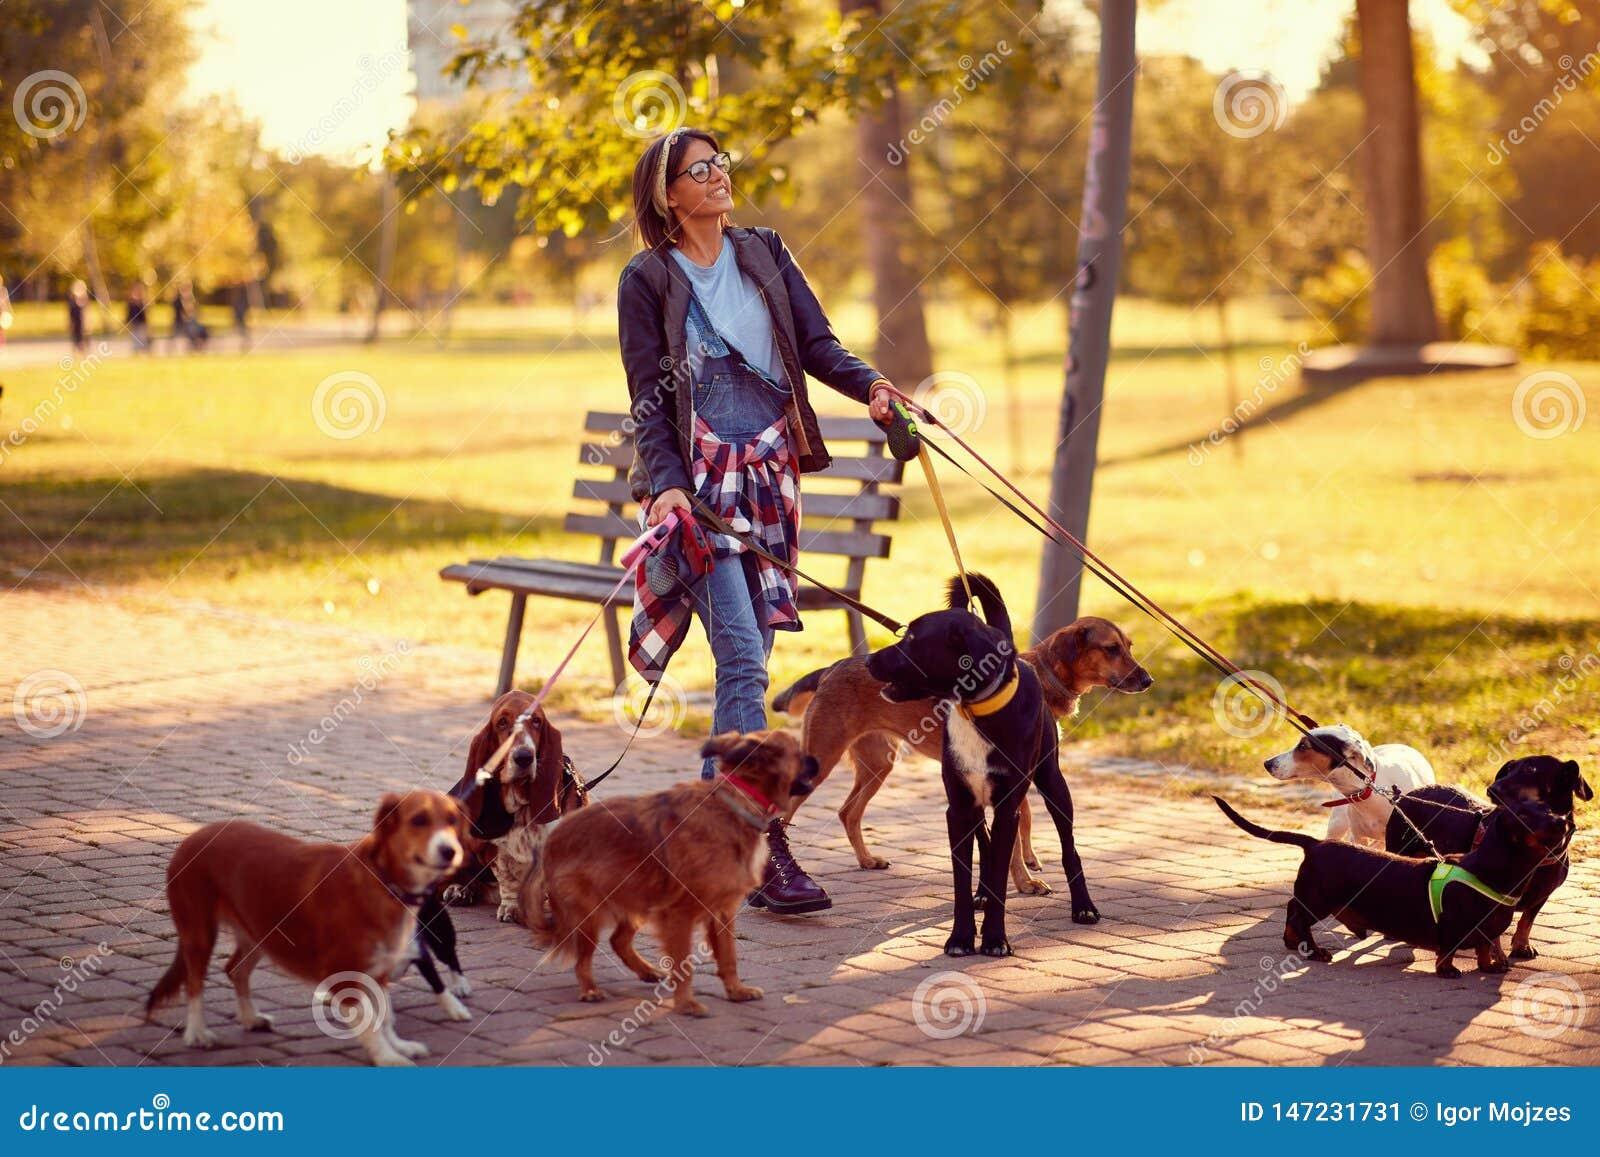 Happy woman dog walker with dogs enjoying in funny walking